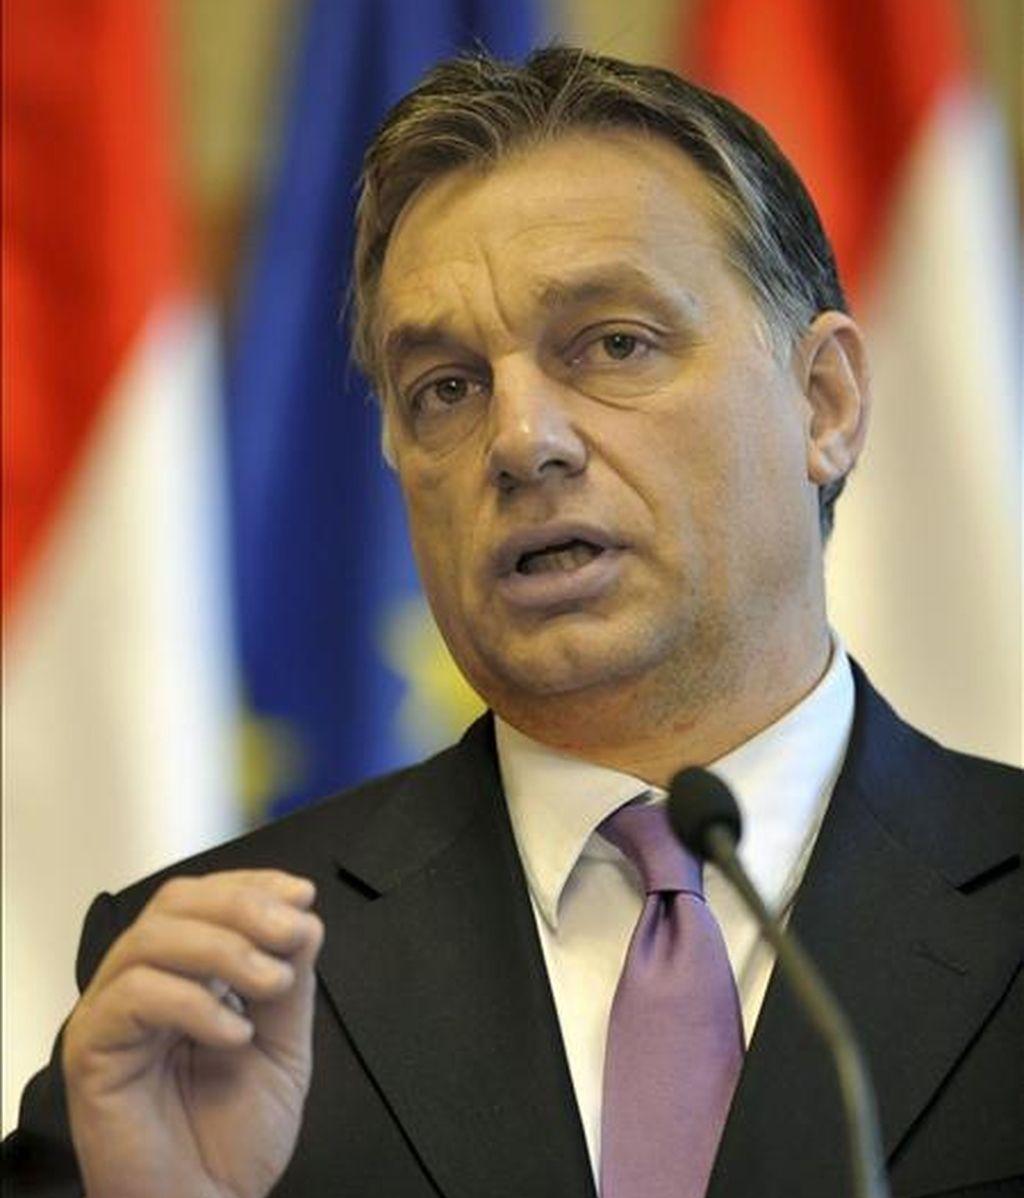 El primer ministro húngaro, Viktor Orban. EFE/Archivo